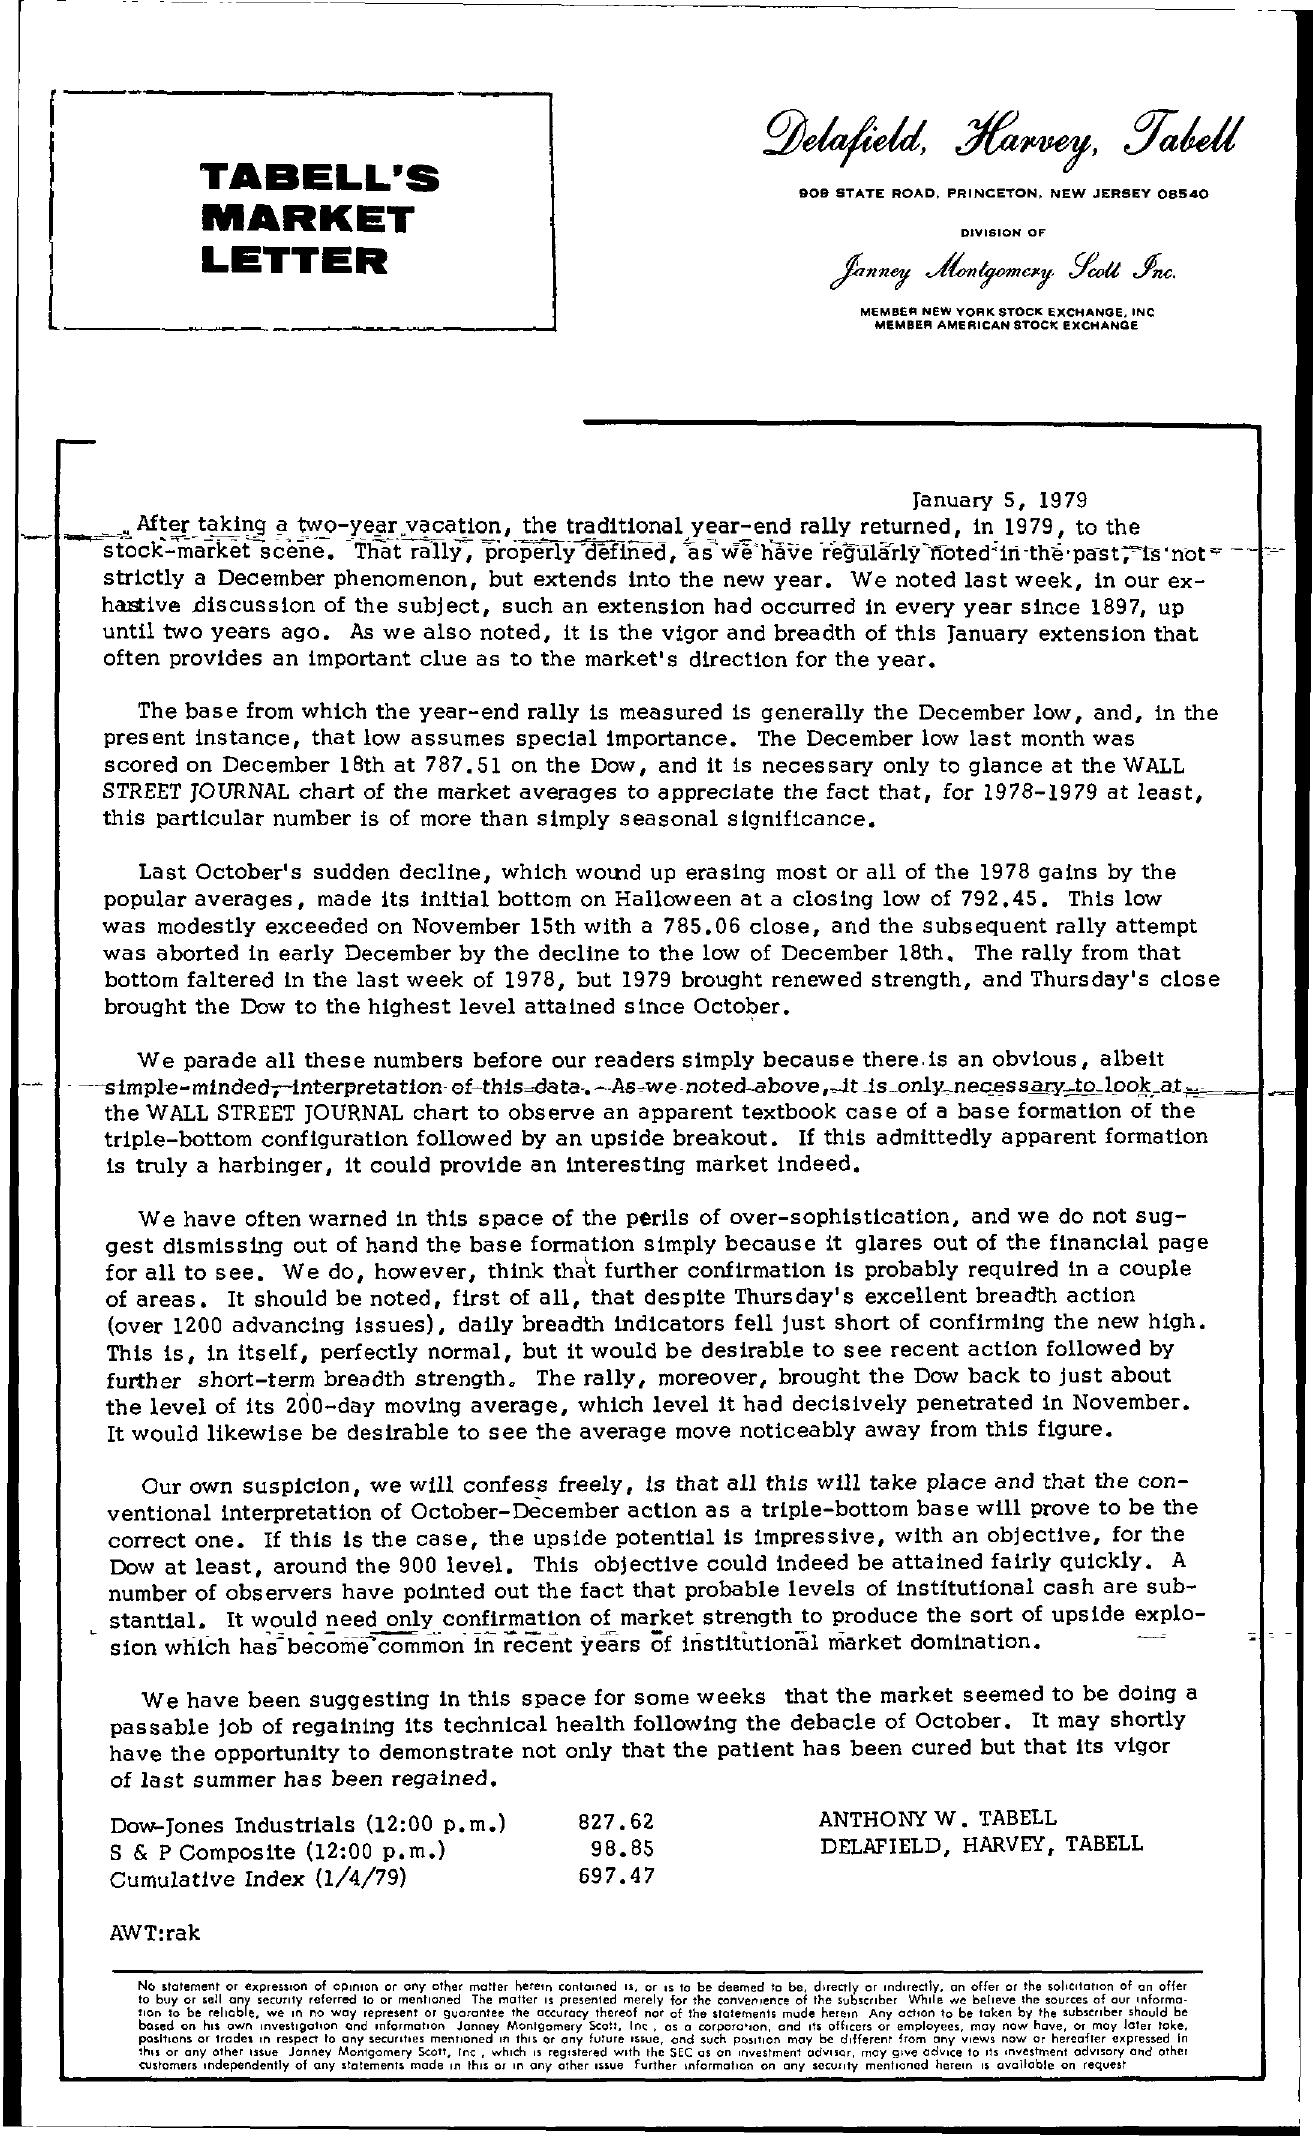 Tabell's Market Letter - January 05, 1979